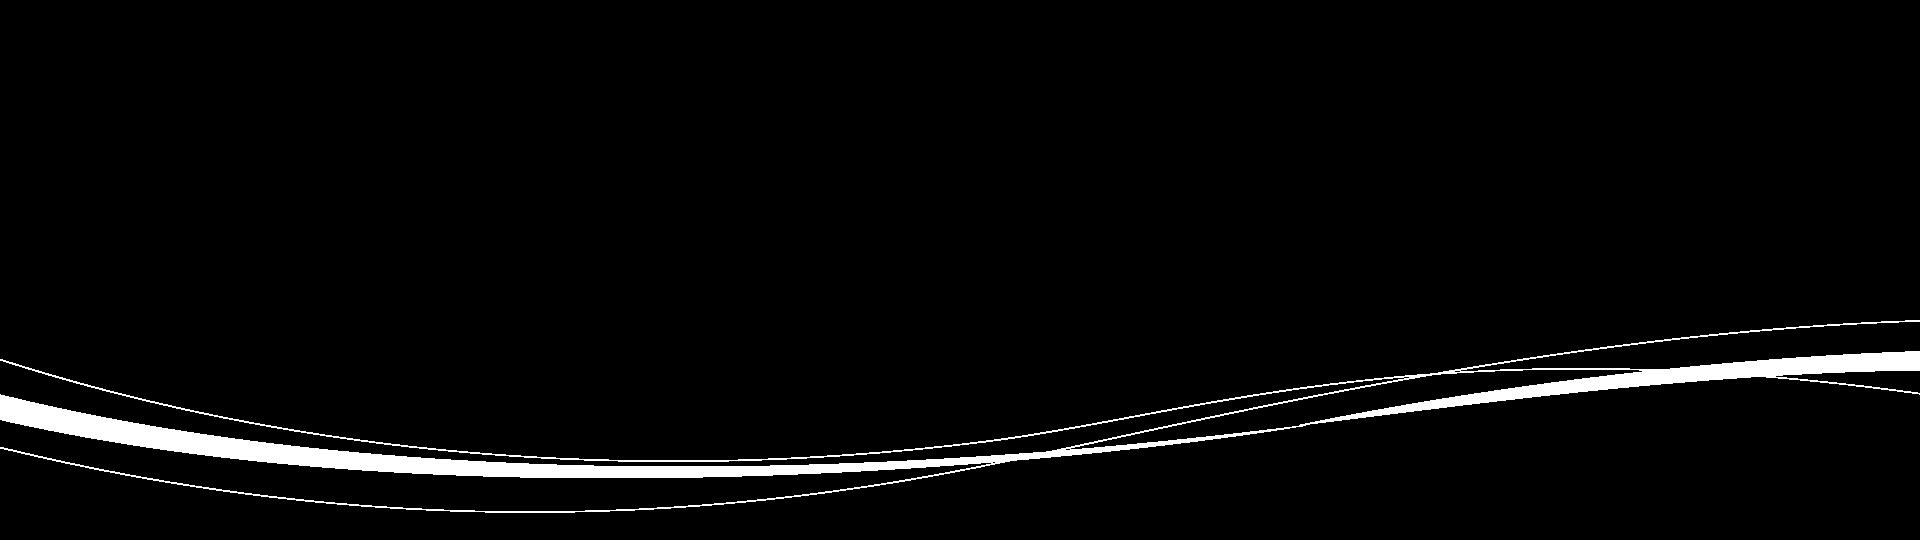 grey_lines_bkg